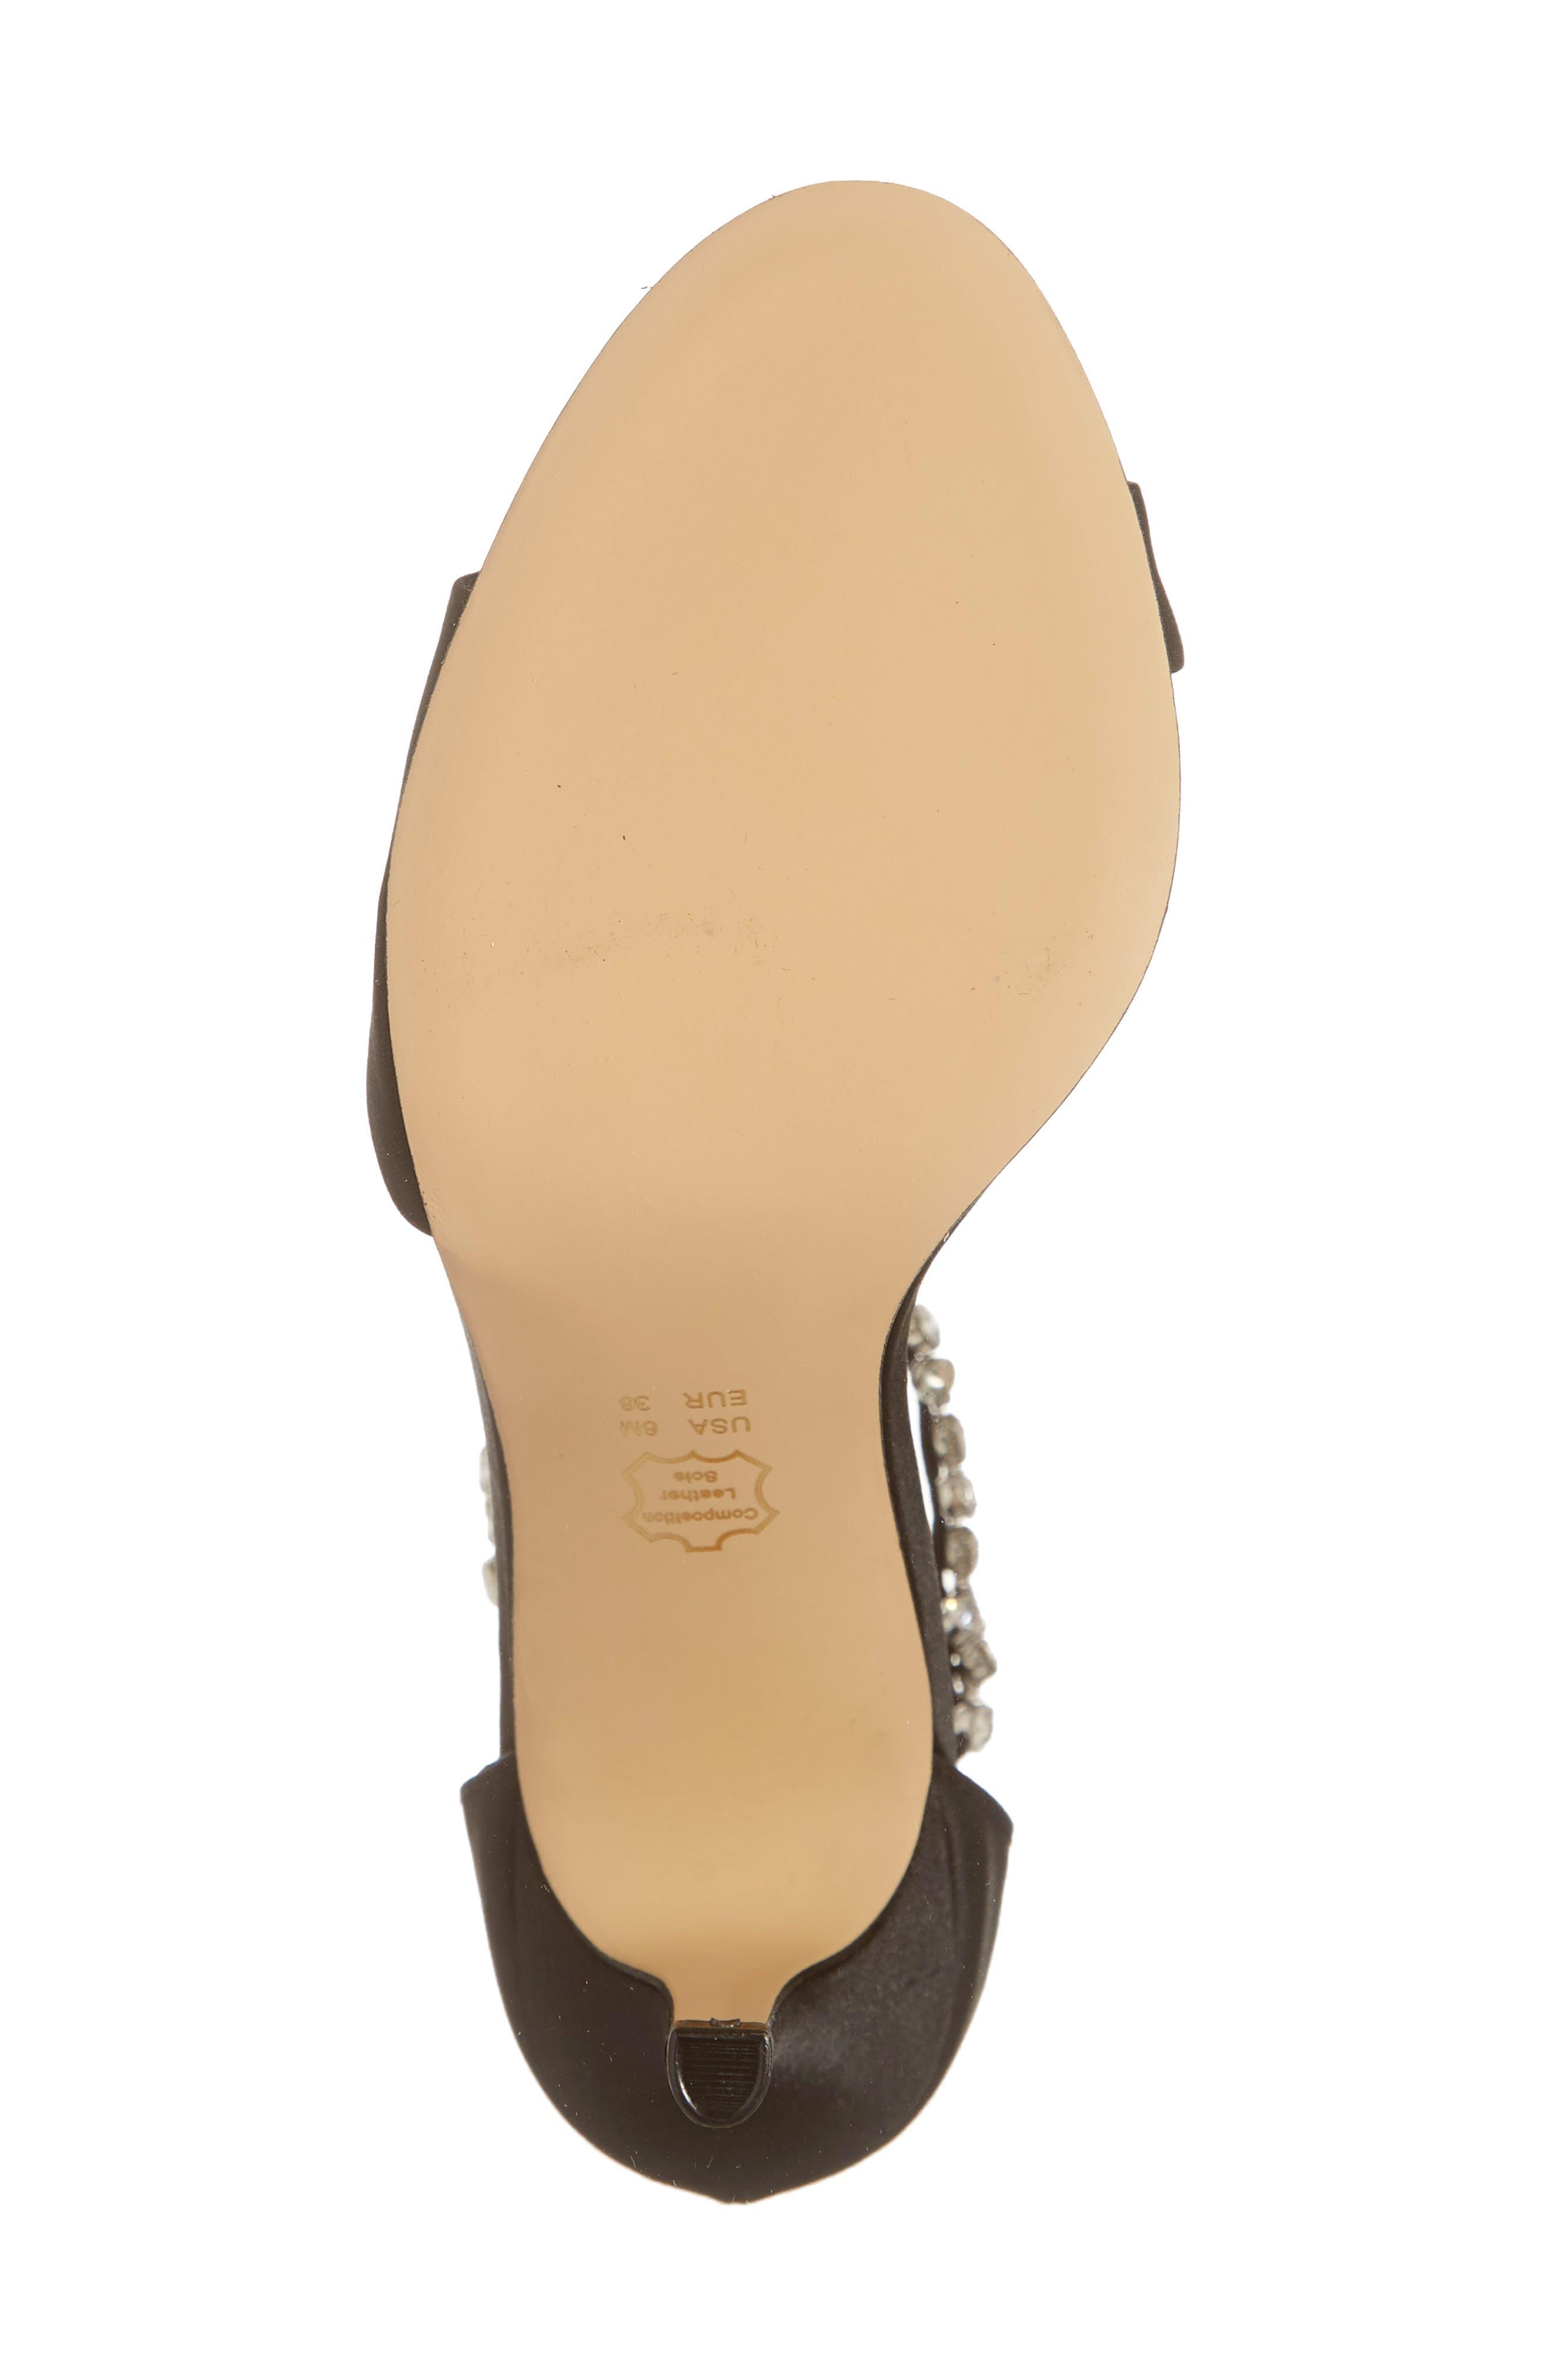 NINA, Vera Embellished Ankle Strap Sandal, Alternate thumbnail 6, color, BLACK SATIN